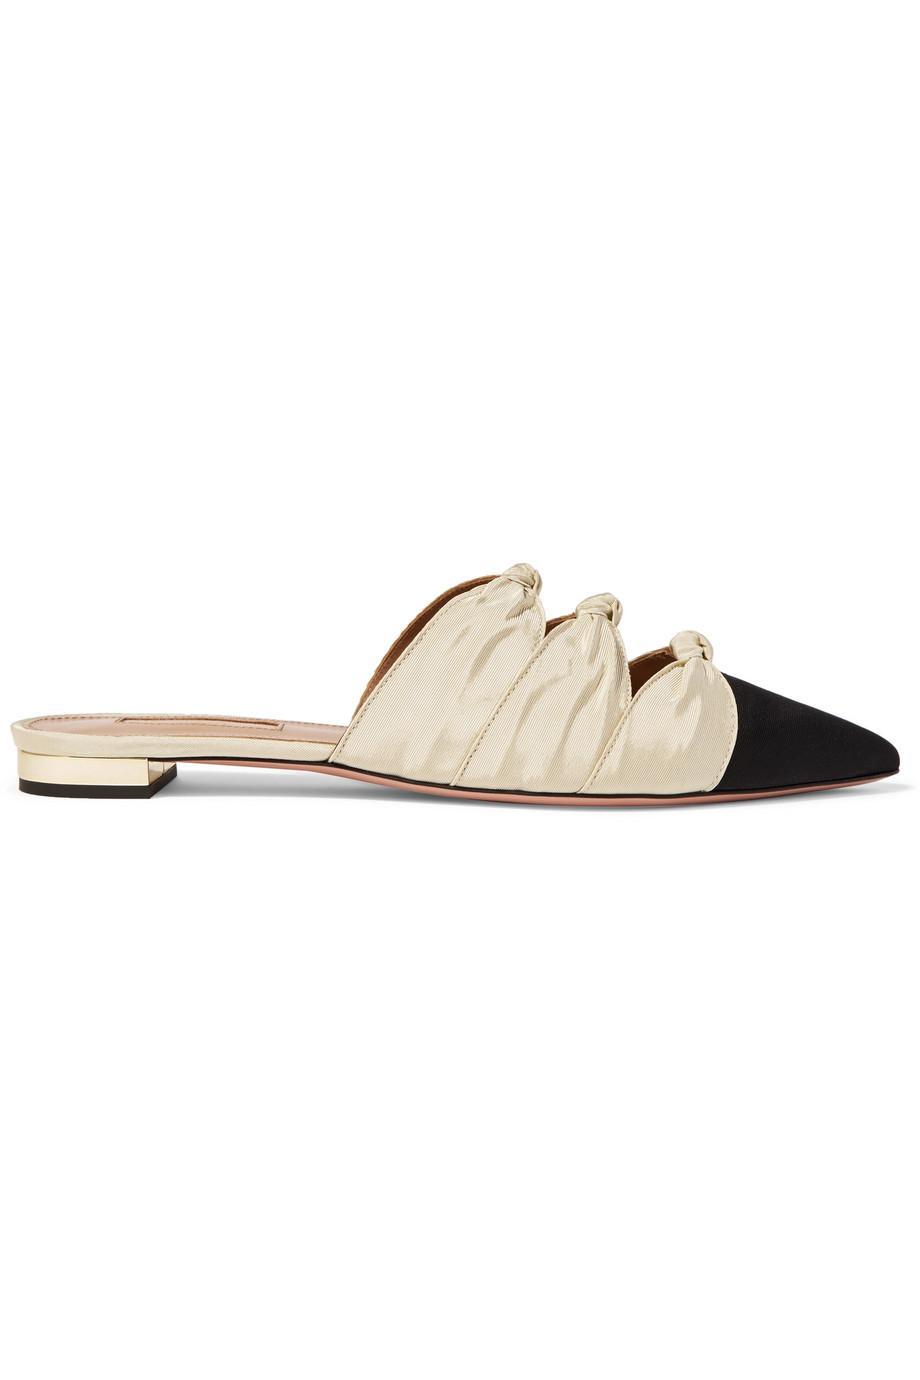 Aquazzura Mondaine grosgrain slippers QxF1s5o1